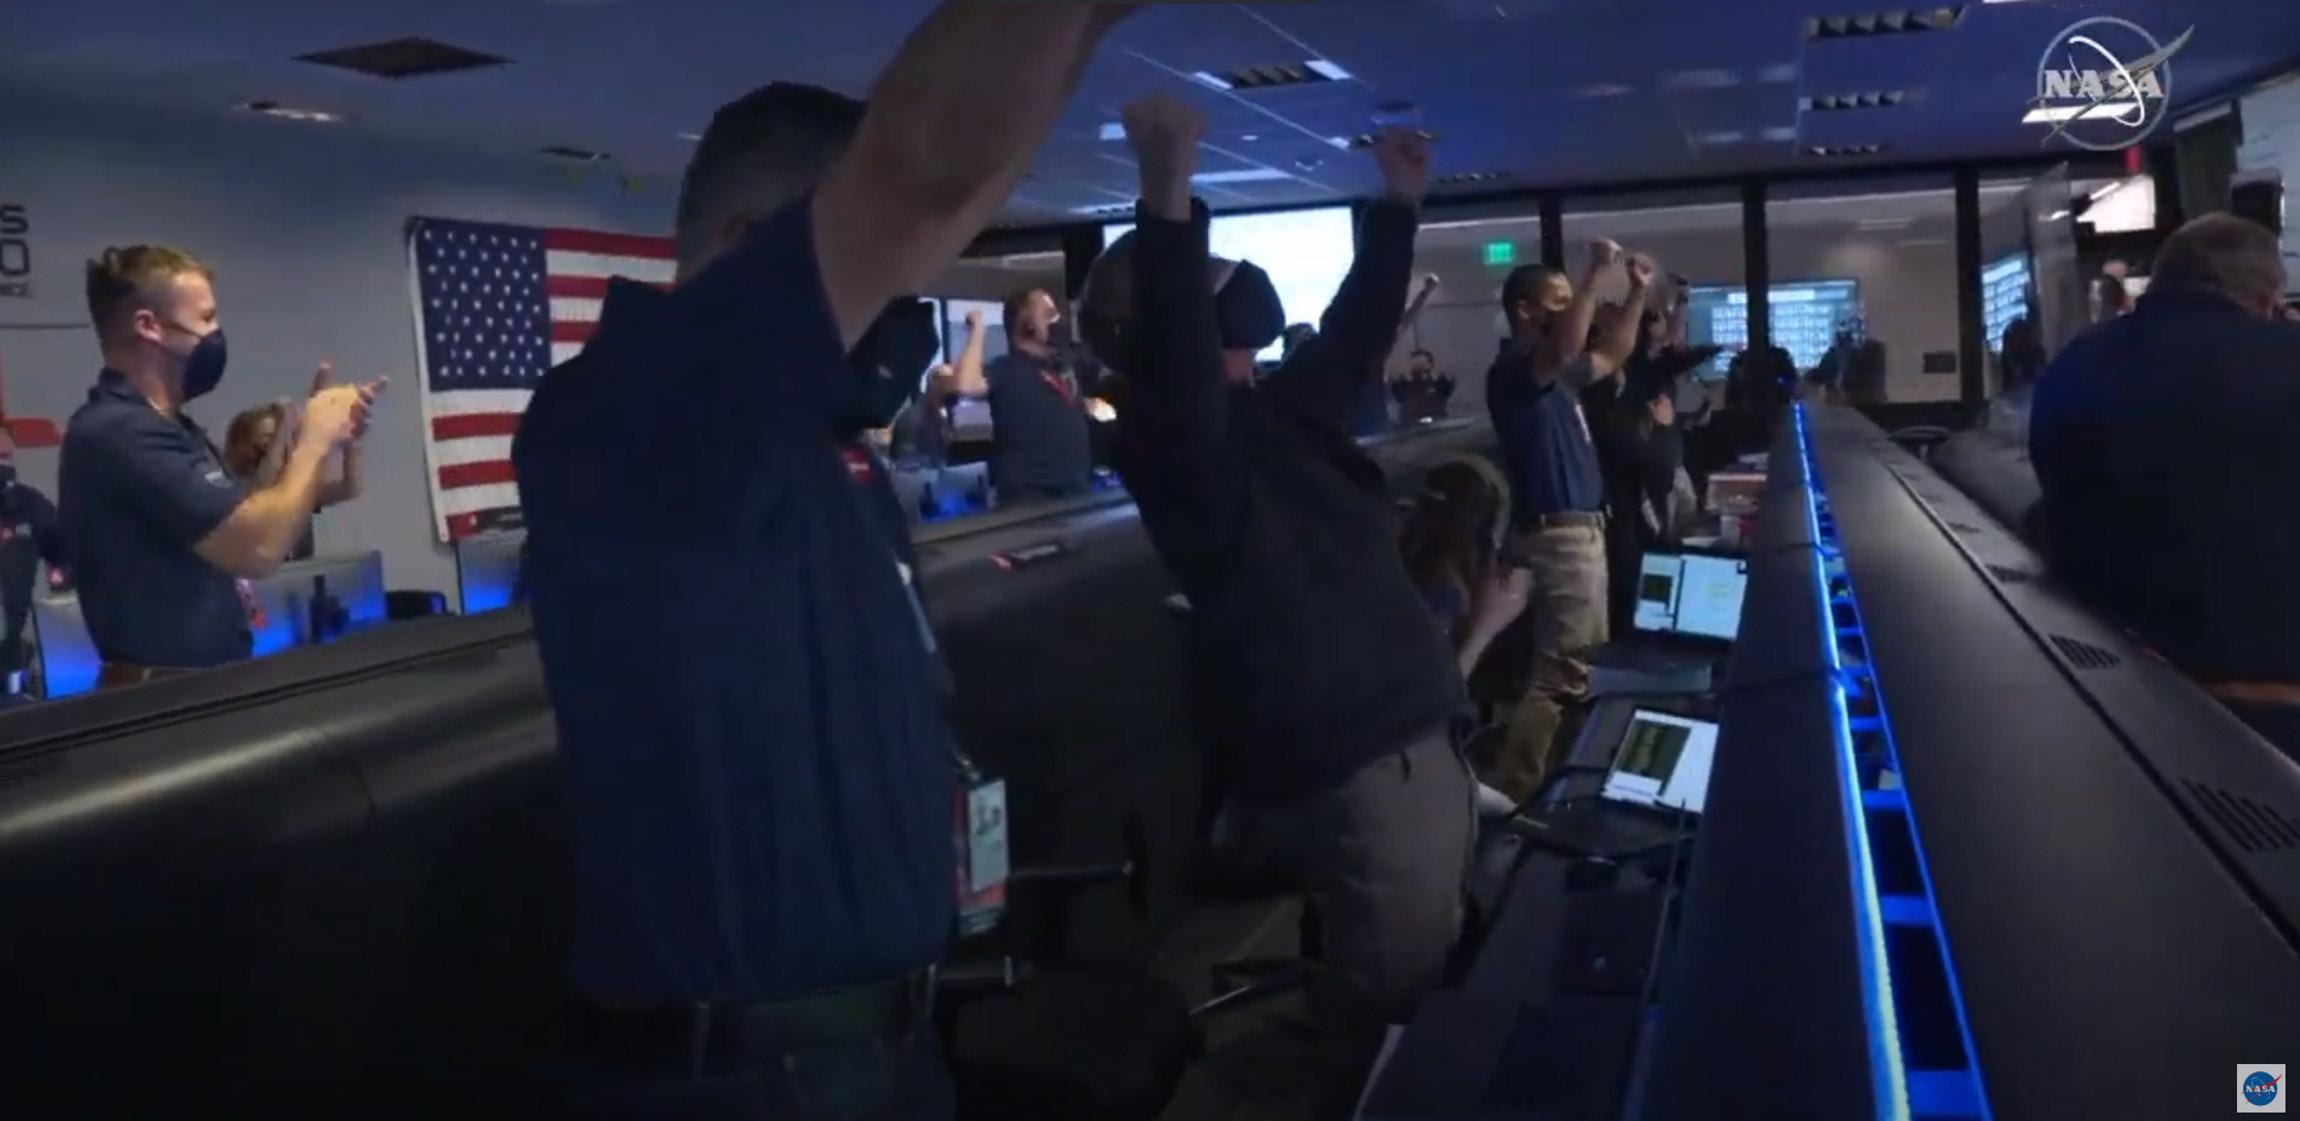 Perseverance: «Πάτησε» στον Άρη κι έγραψε ιστορία – Οι πρώτες φωτογραφίες (video)